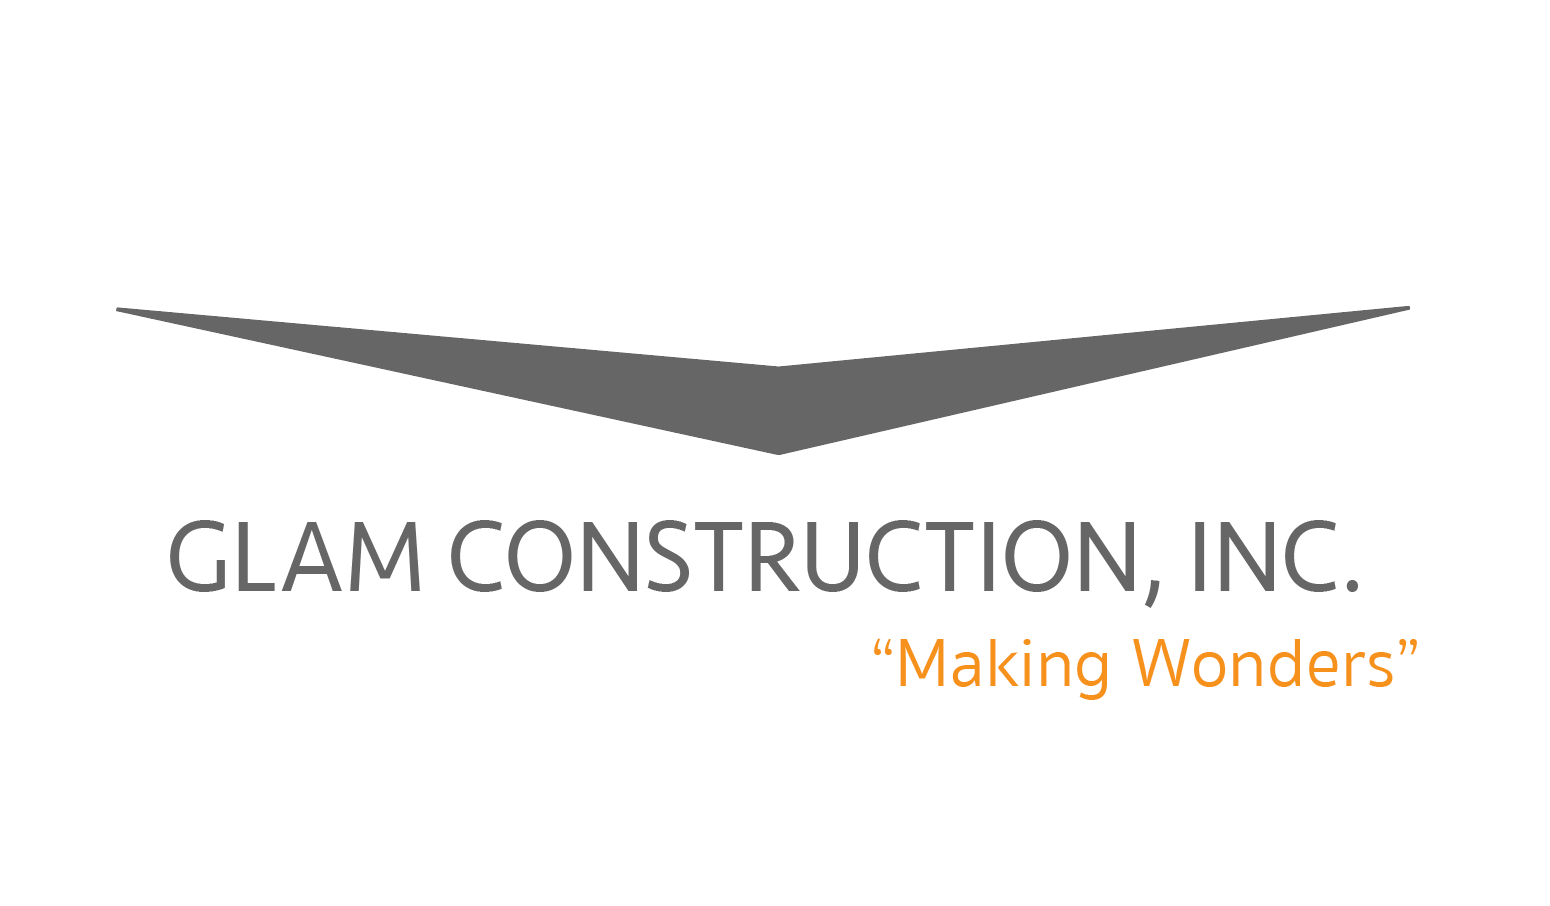 Glam Construction Inc